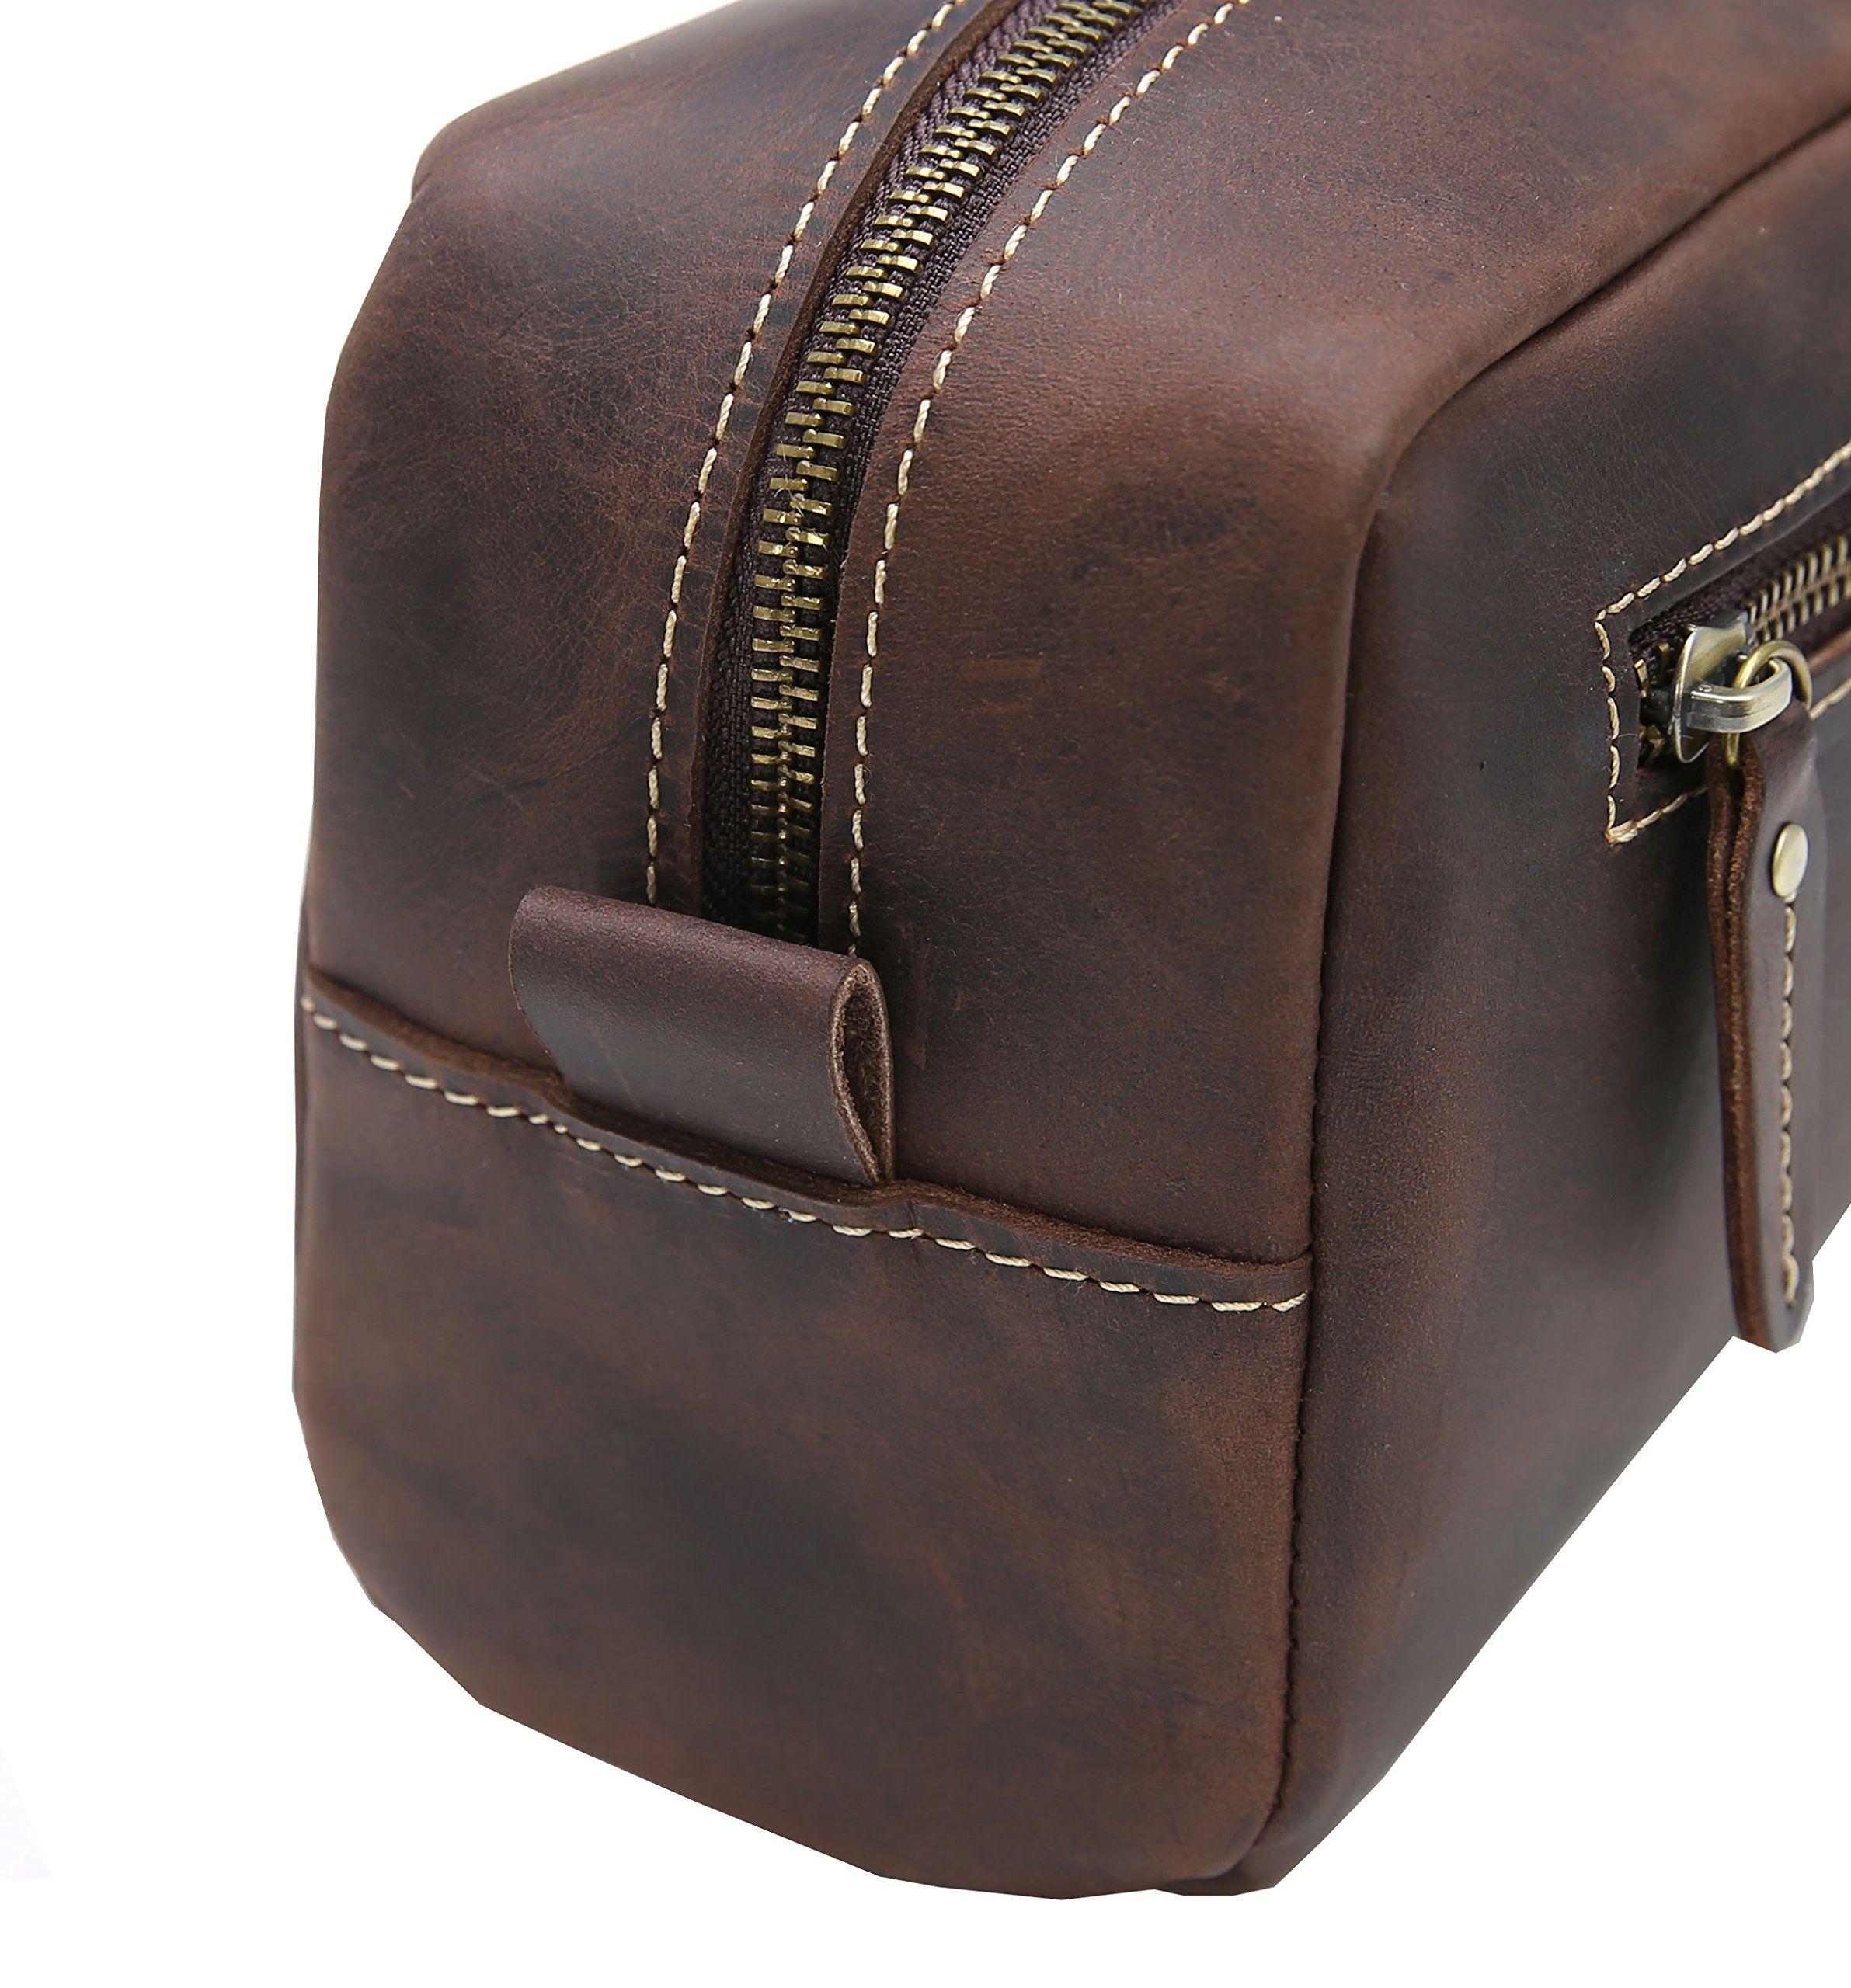 Travel Toiletry Bag Leather Wash Bag Iswee Shaving Grooming Dopp Kit Makeup Bag Cosmetic Bagdark Brown Cli Leather Wash Bag Toiletry Bag Travel Toiletry Bag